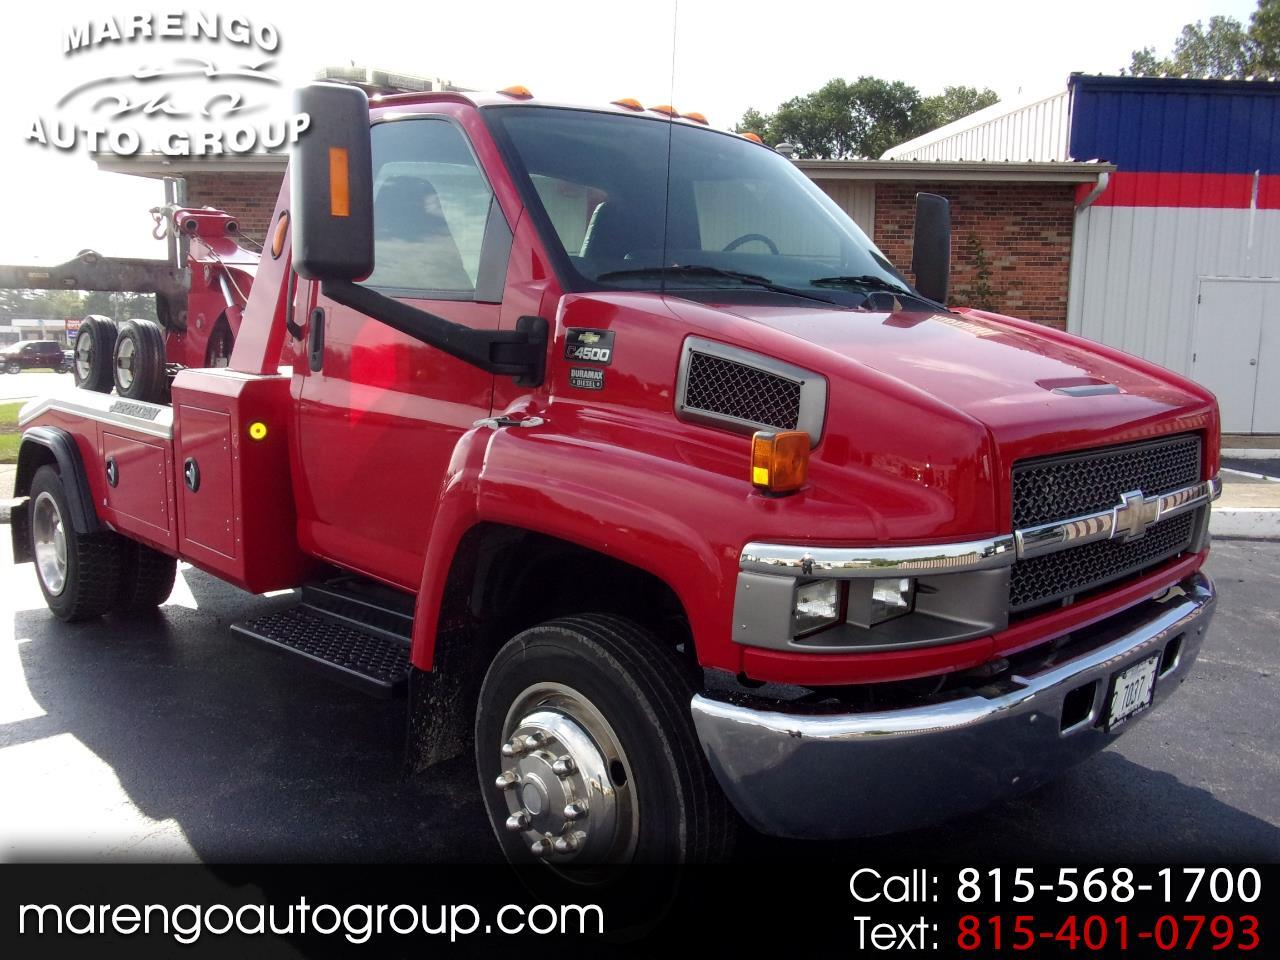 2009 Chevrolet CC4500 Regular Cab 2WD